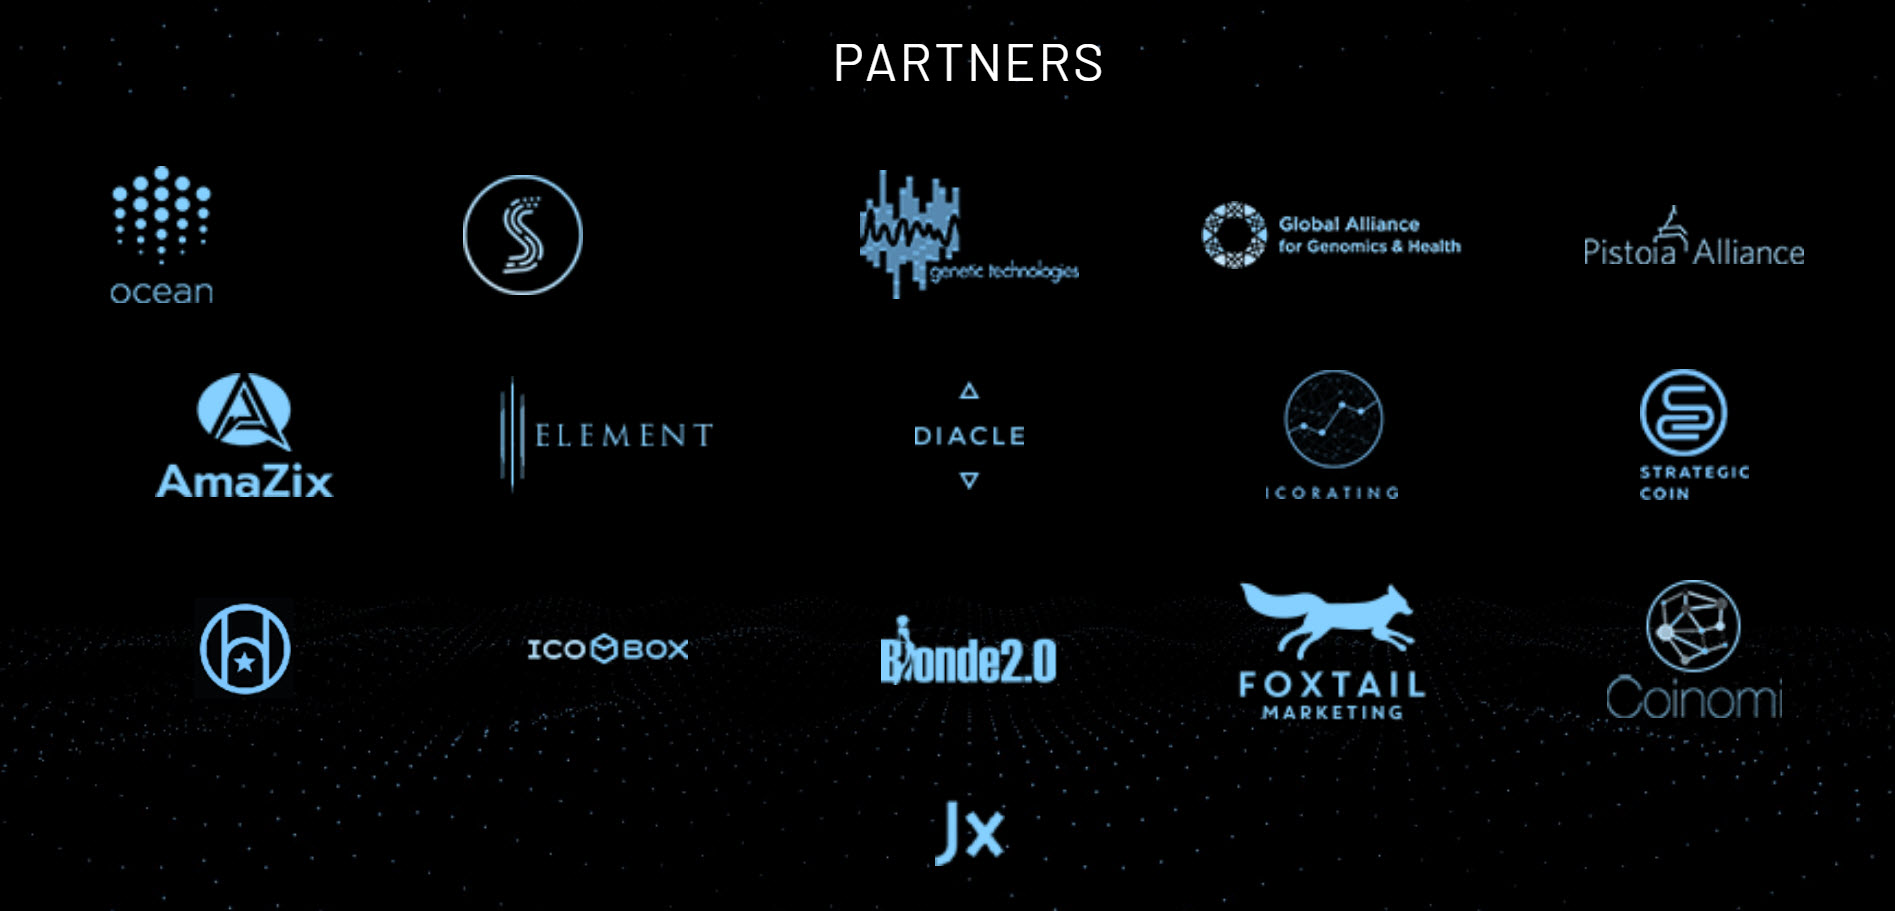 партнеры проекта.jpg